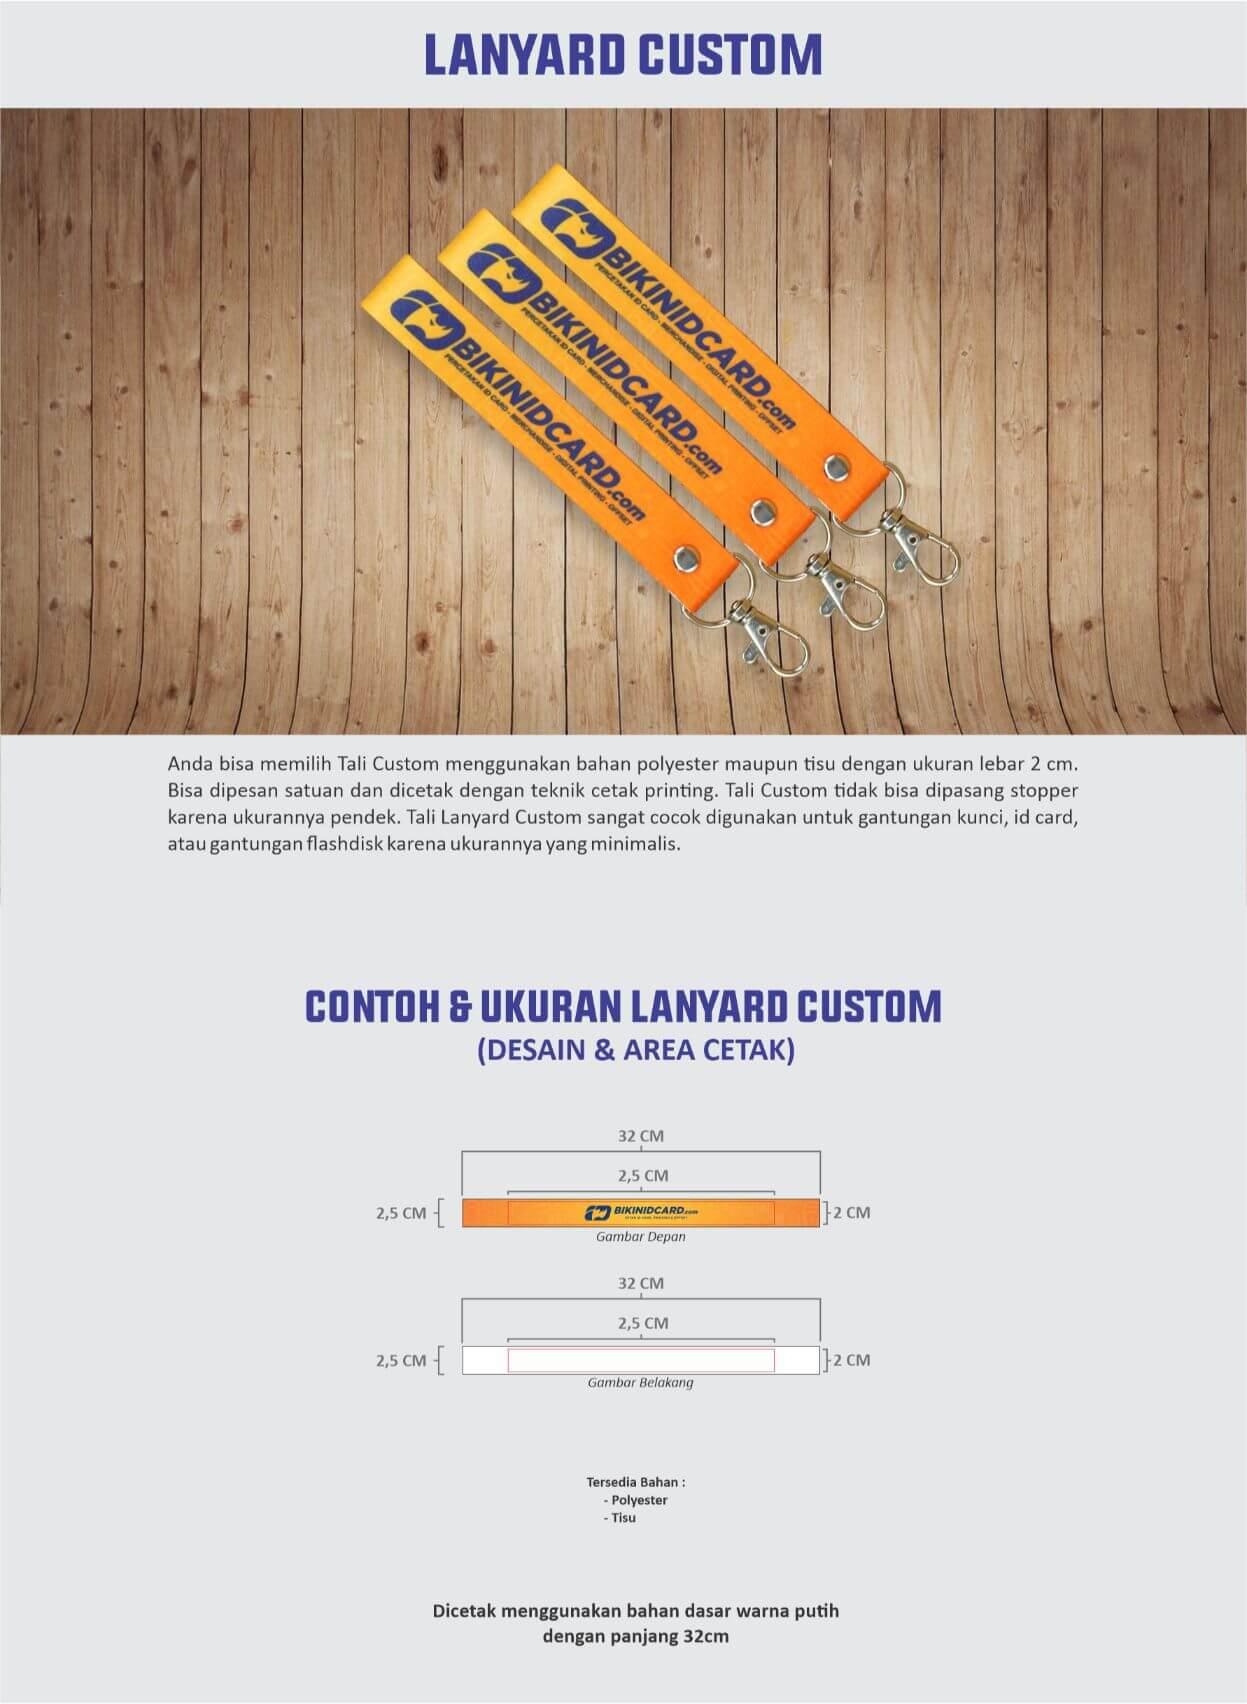 area desain lanyard custom